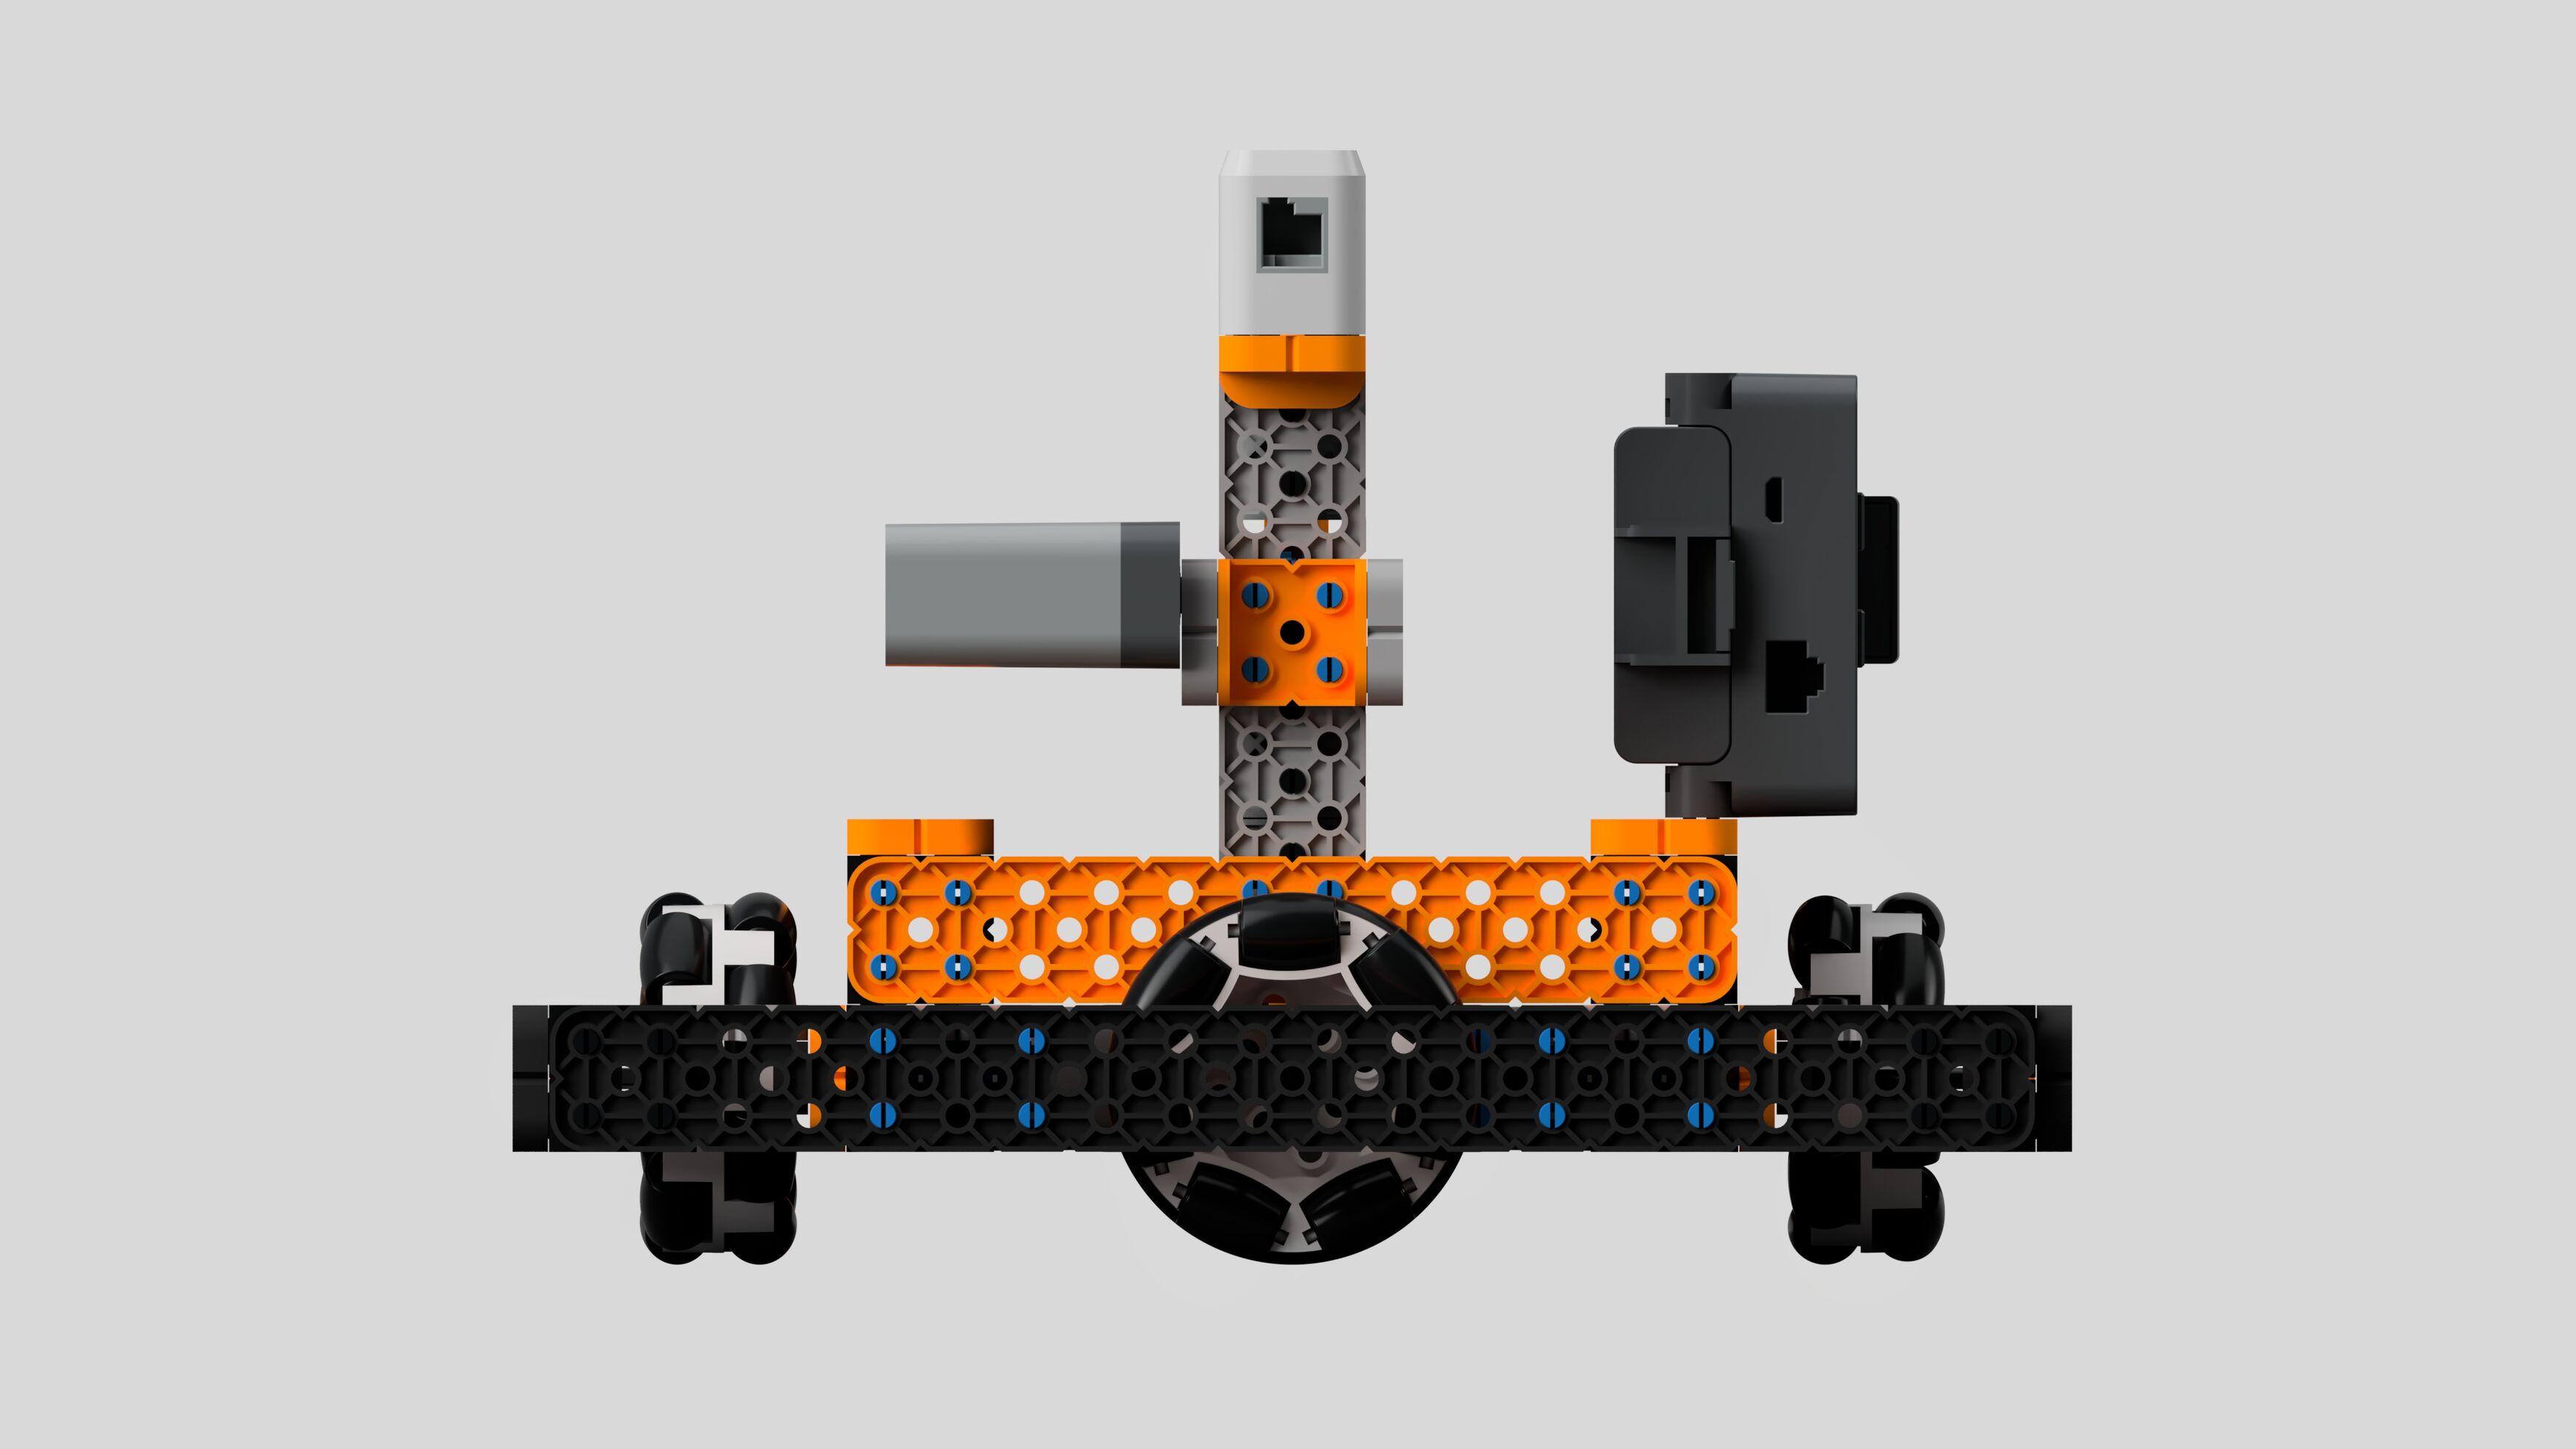 Robotics-pen-oficial-2-cores---fabrica-de-nerdes-2020-may-28-08-05-24pm-000-customizedview18137423500-png-3500-3500